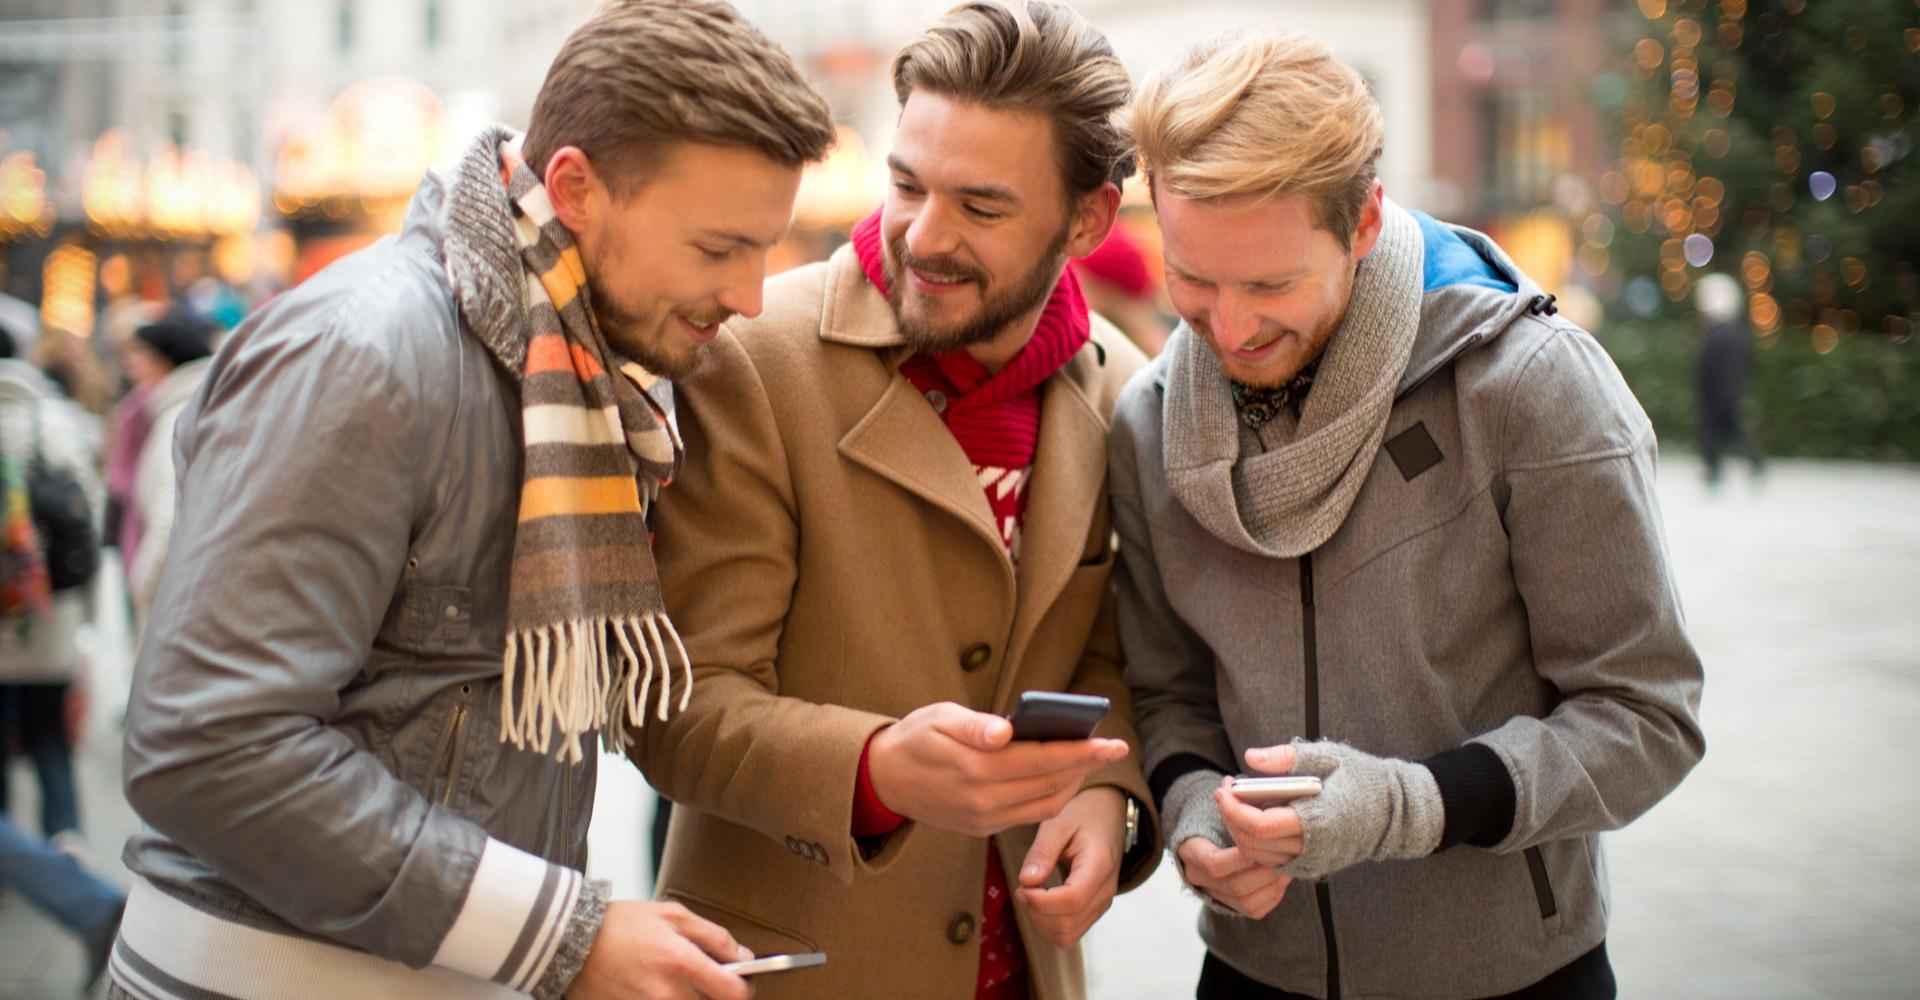 Eine Gruppe junger Männer spielt Skat via Smartphone.